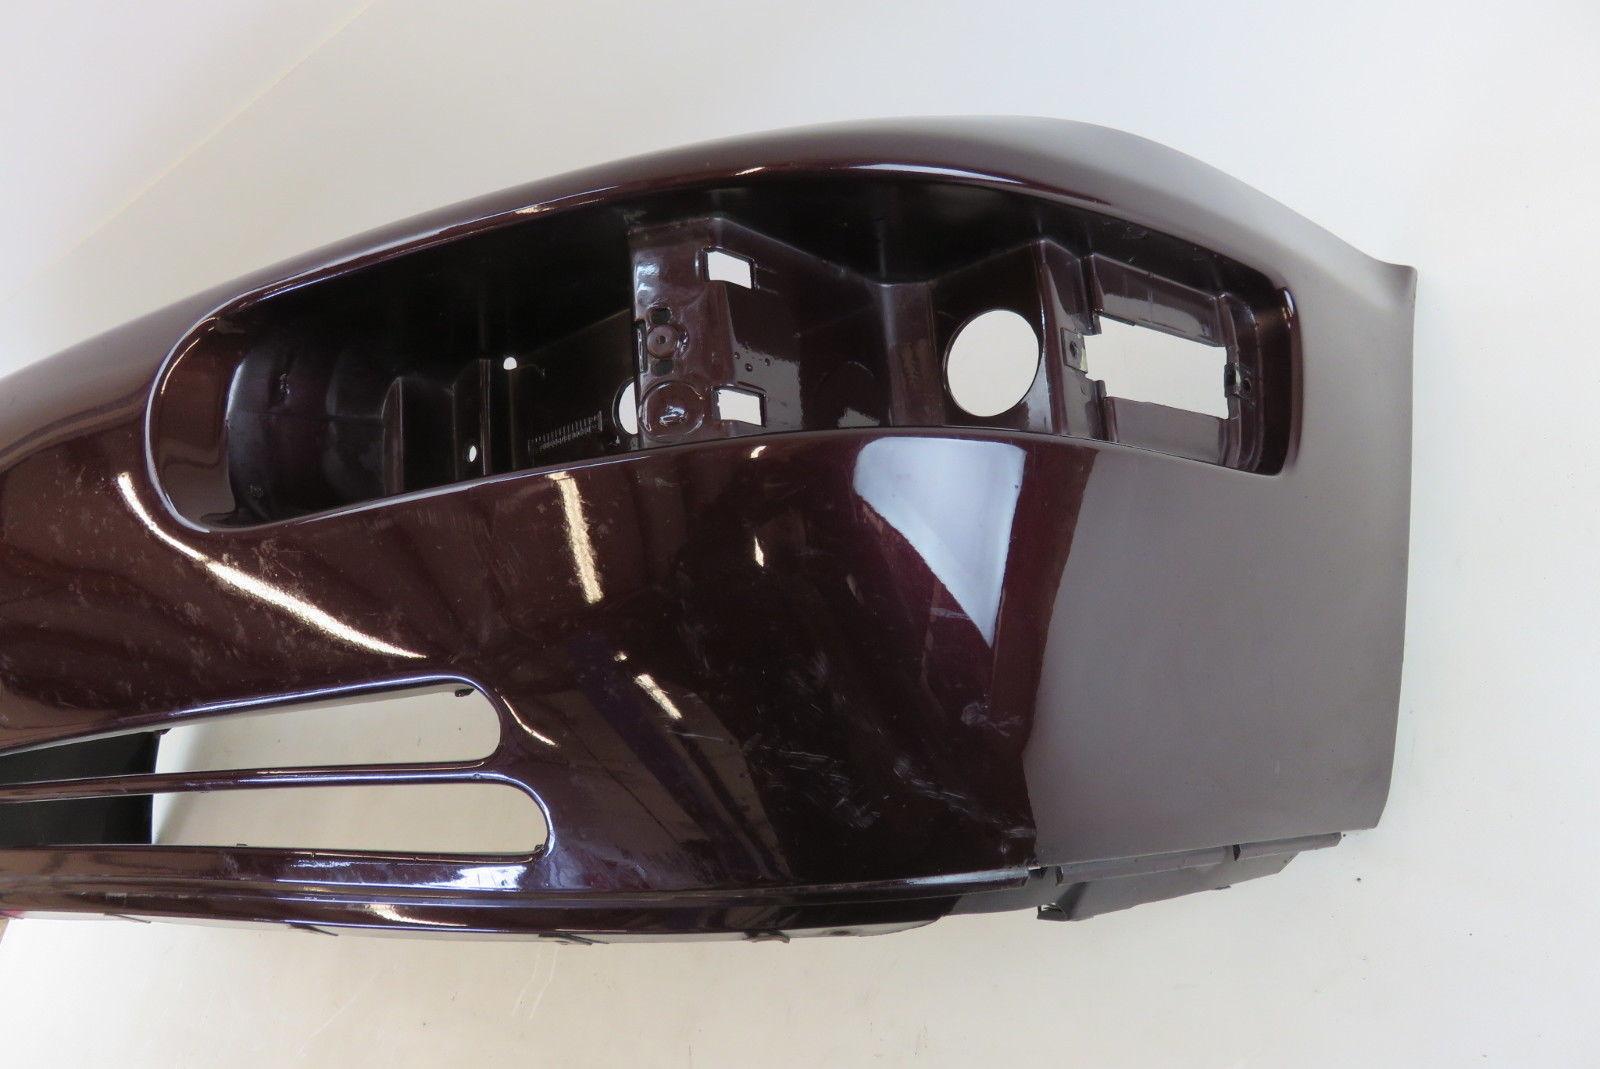 impact absorber front 92850501522 91 Porsche 911 964 C2 bumper shocks